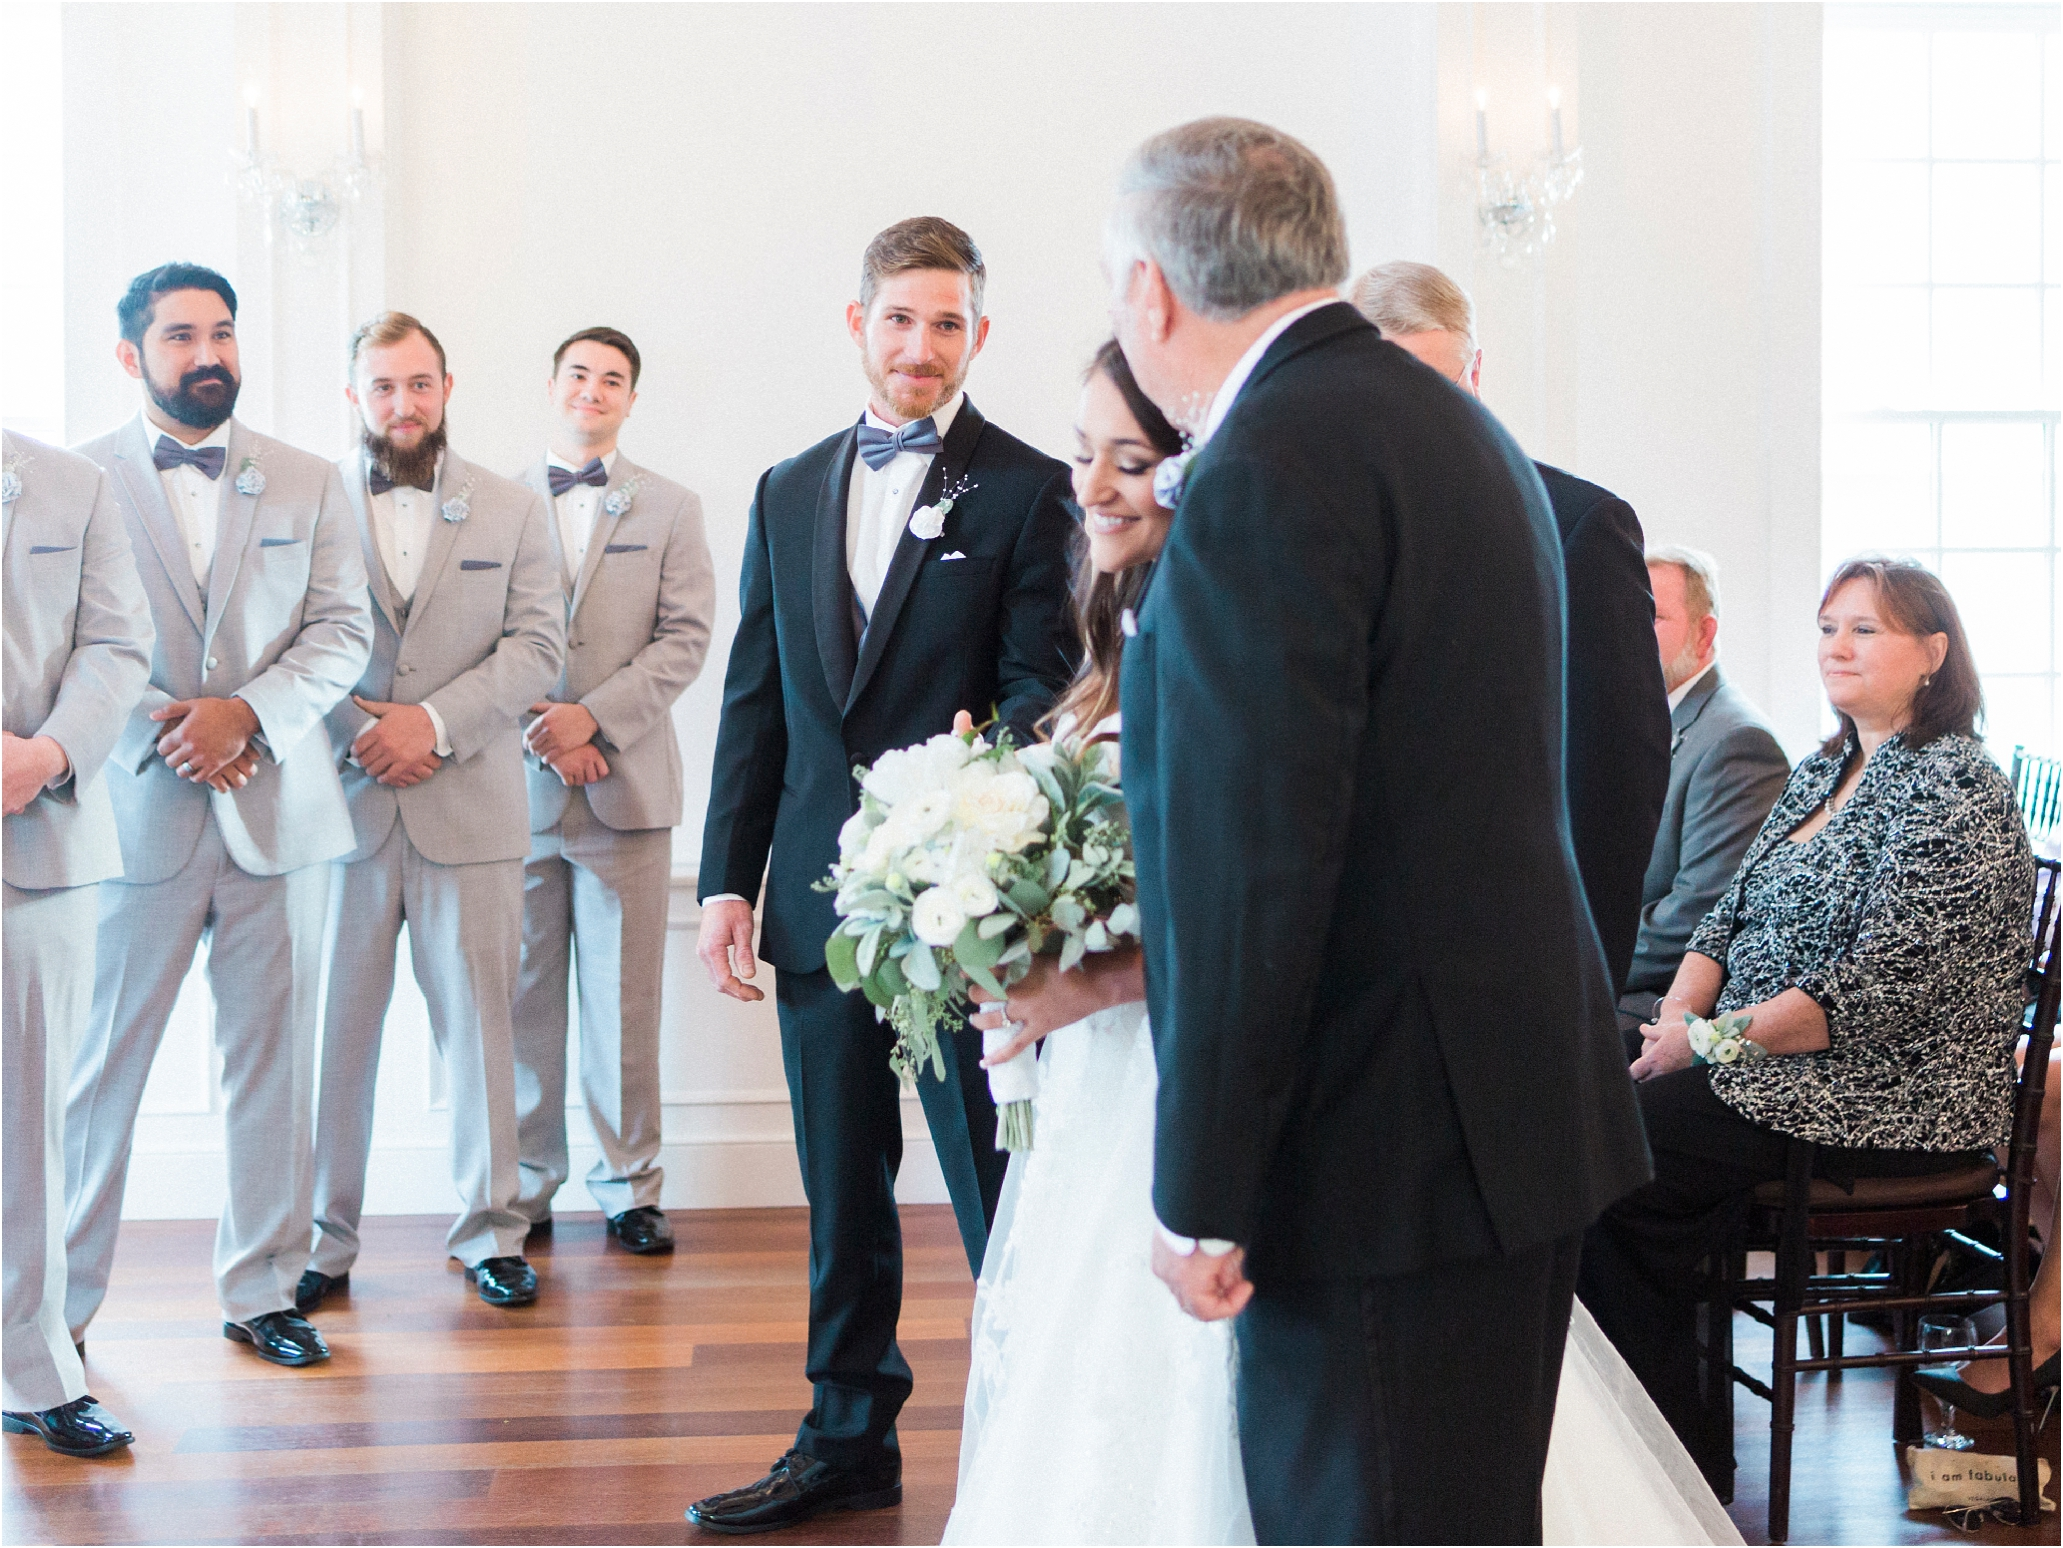 Lisa Silva Photography- Ponte Vedra Beach and Jacksonville, Florida Fine Art Film Wedding Photography- Wedding at The White Room Villa Blanca in St. Augustine, Florida_0046.jpg